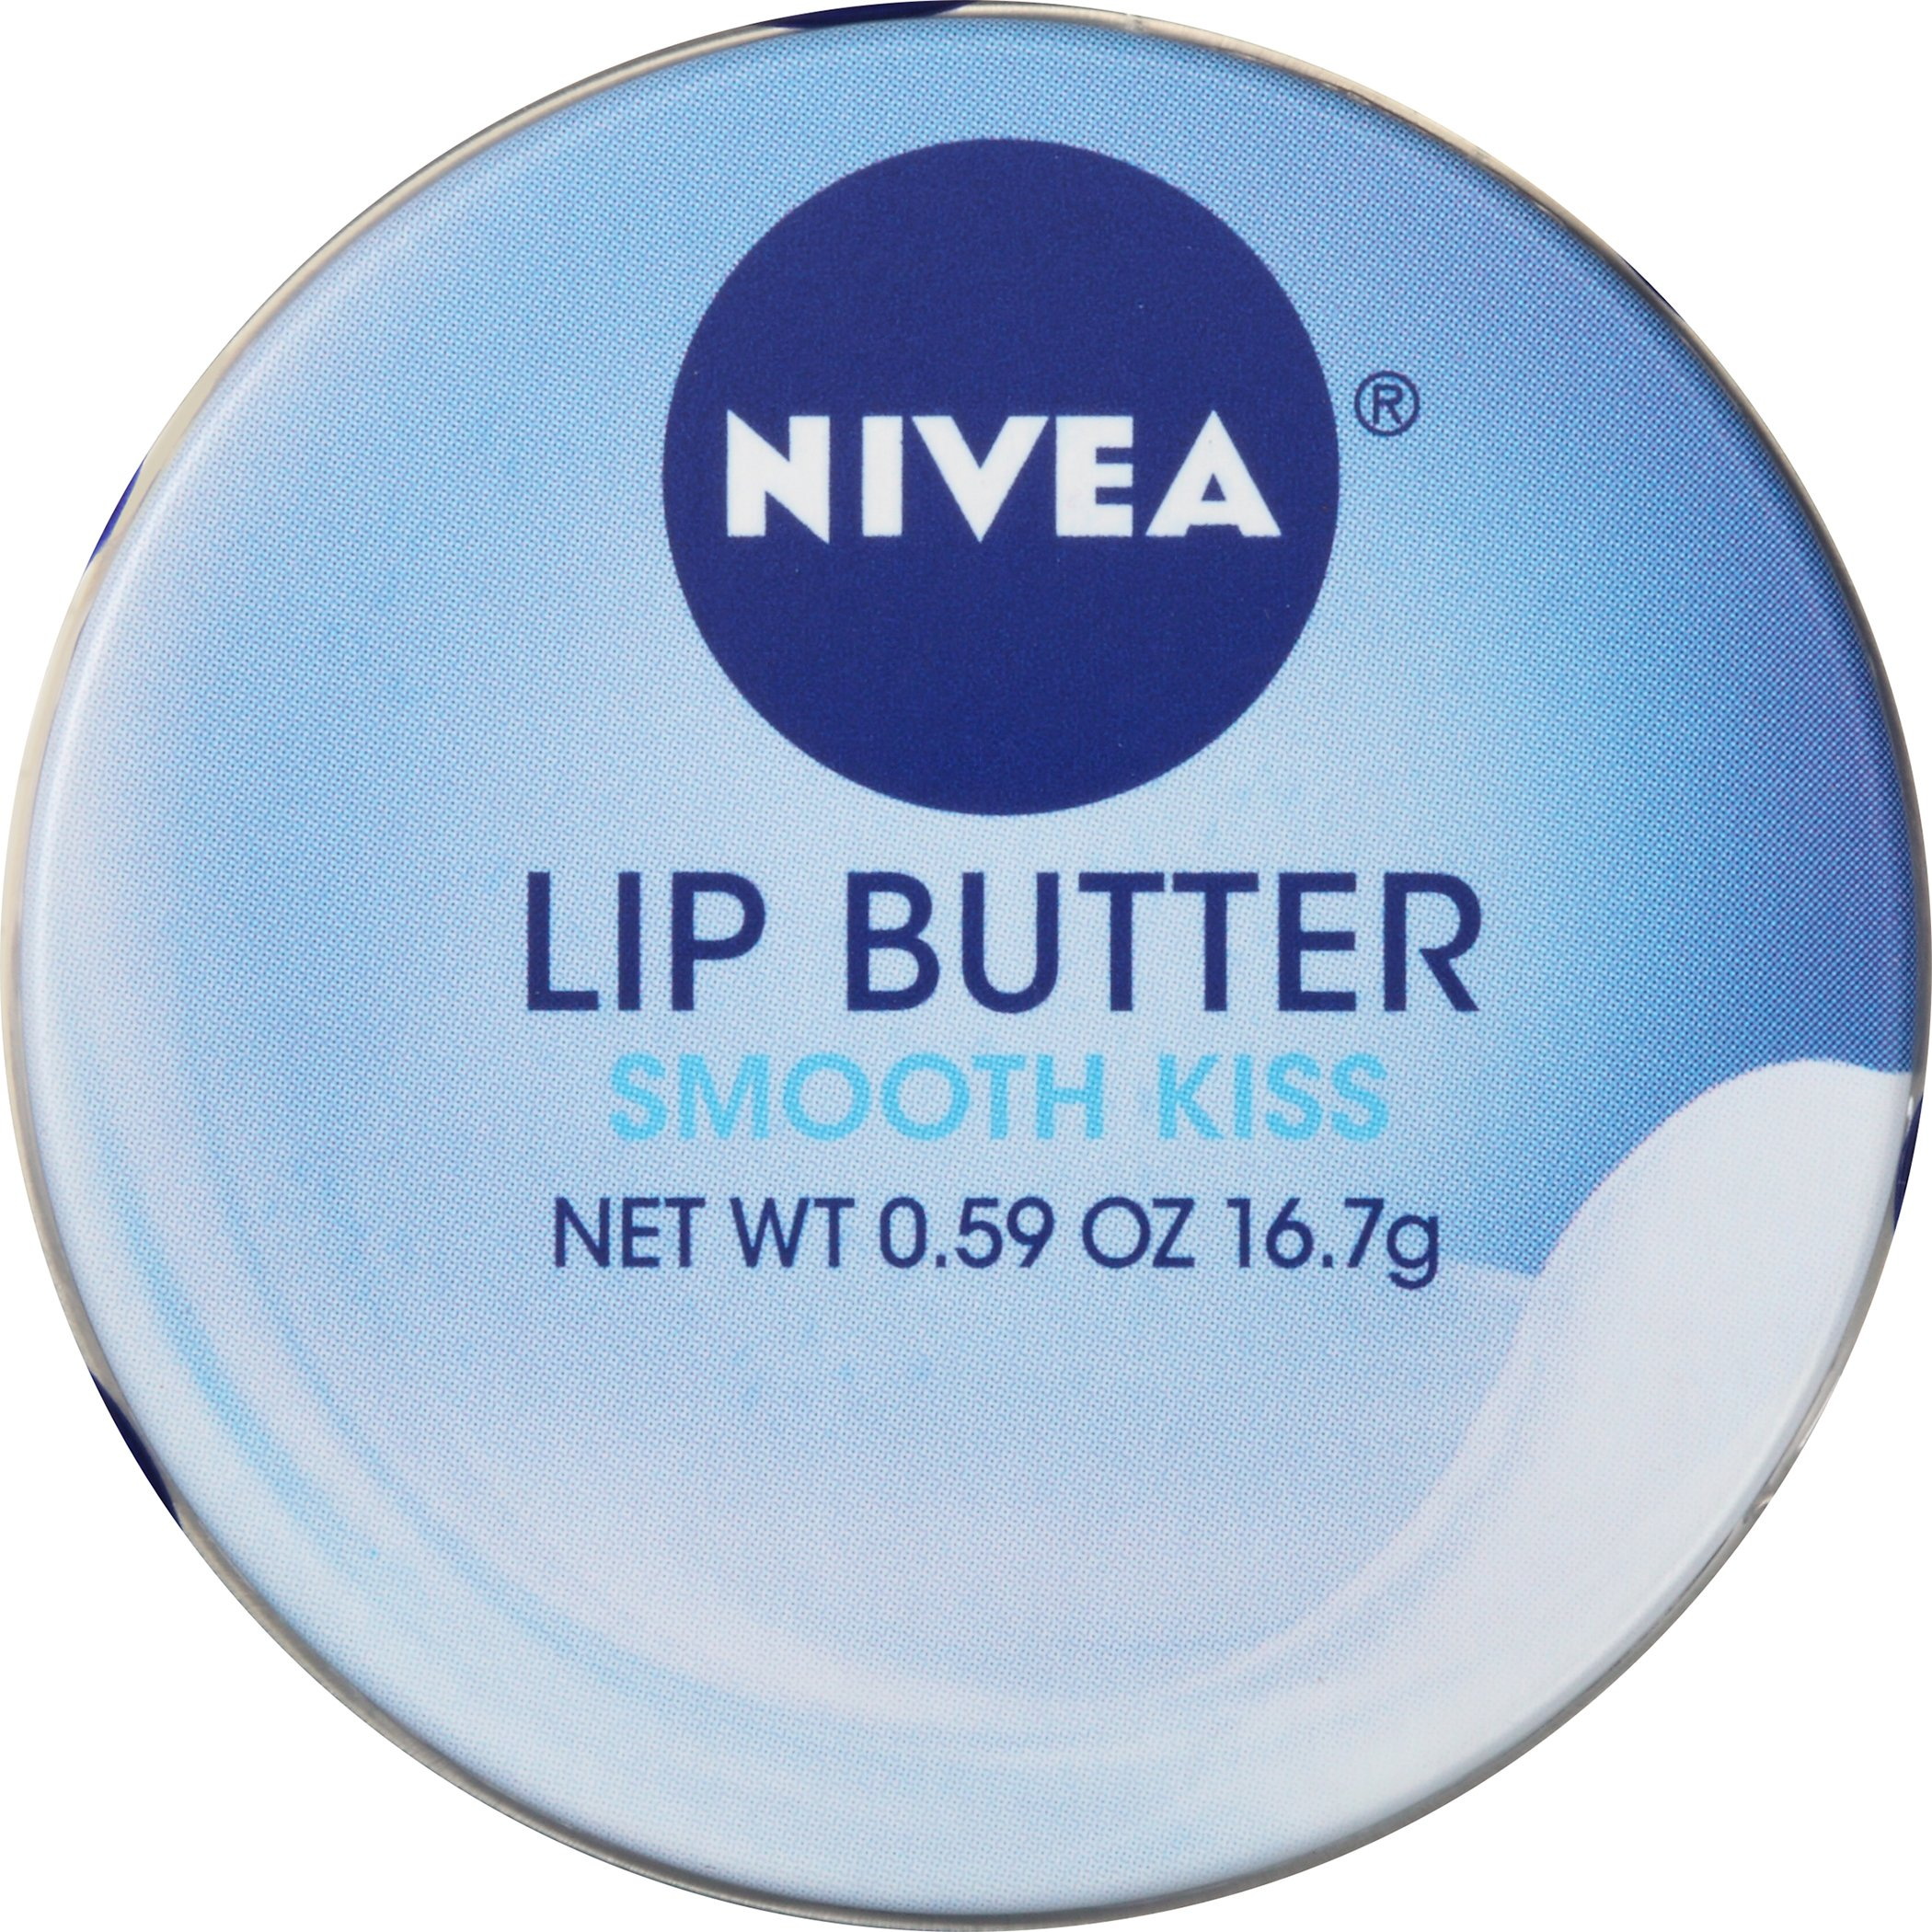 NIVEA Lip Butter Loose Tin, Smooth Kiss, 0.59 Ounce by Nivea